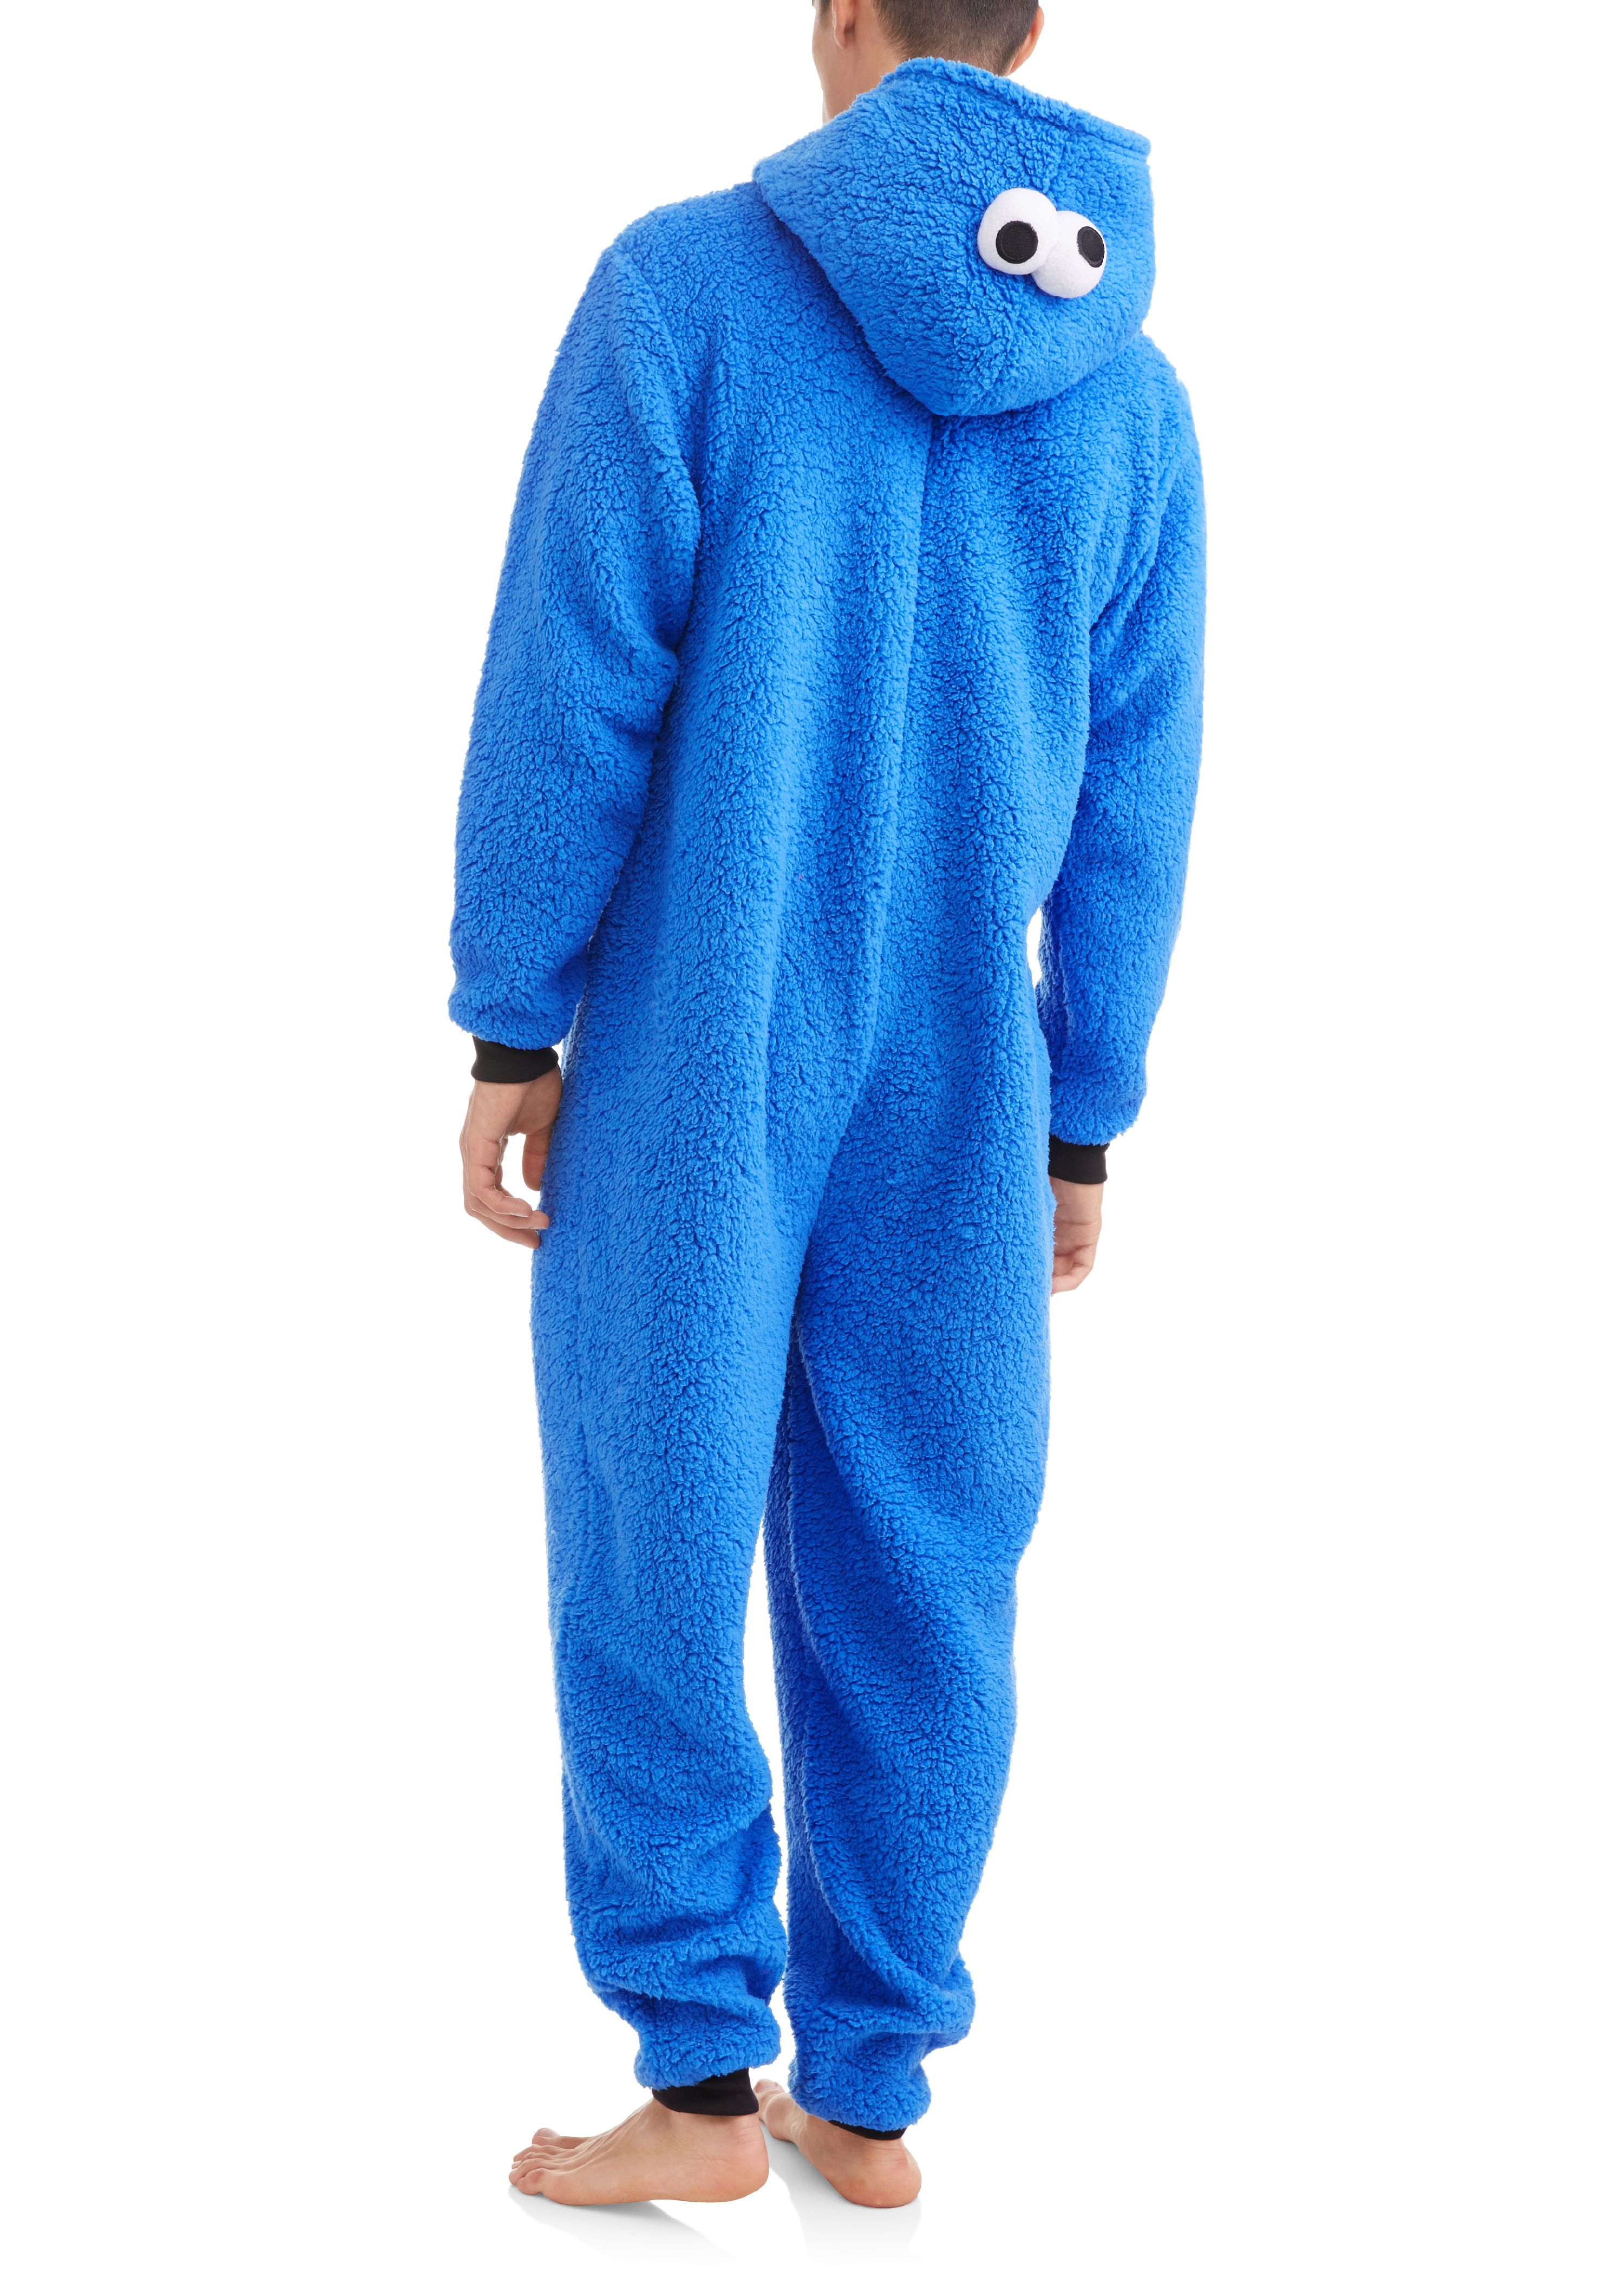 Cookie Monster Men s esie Union Suit Walmart